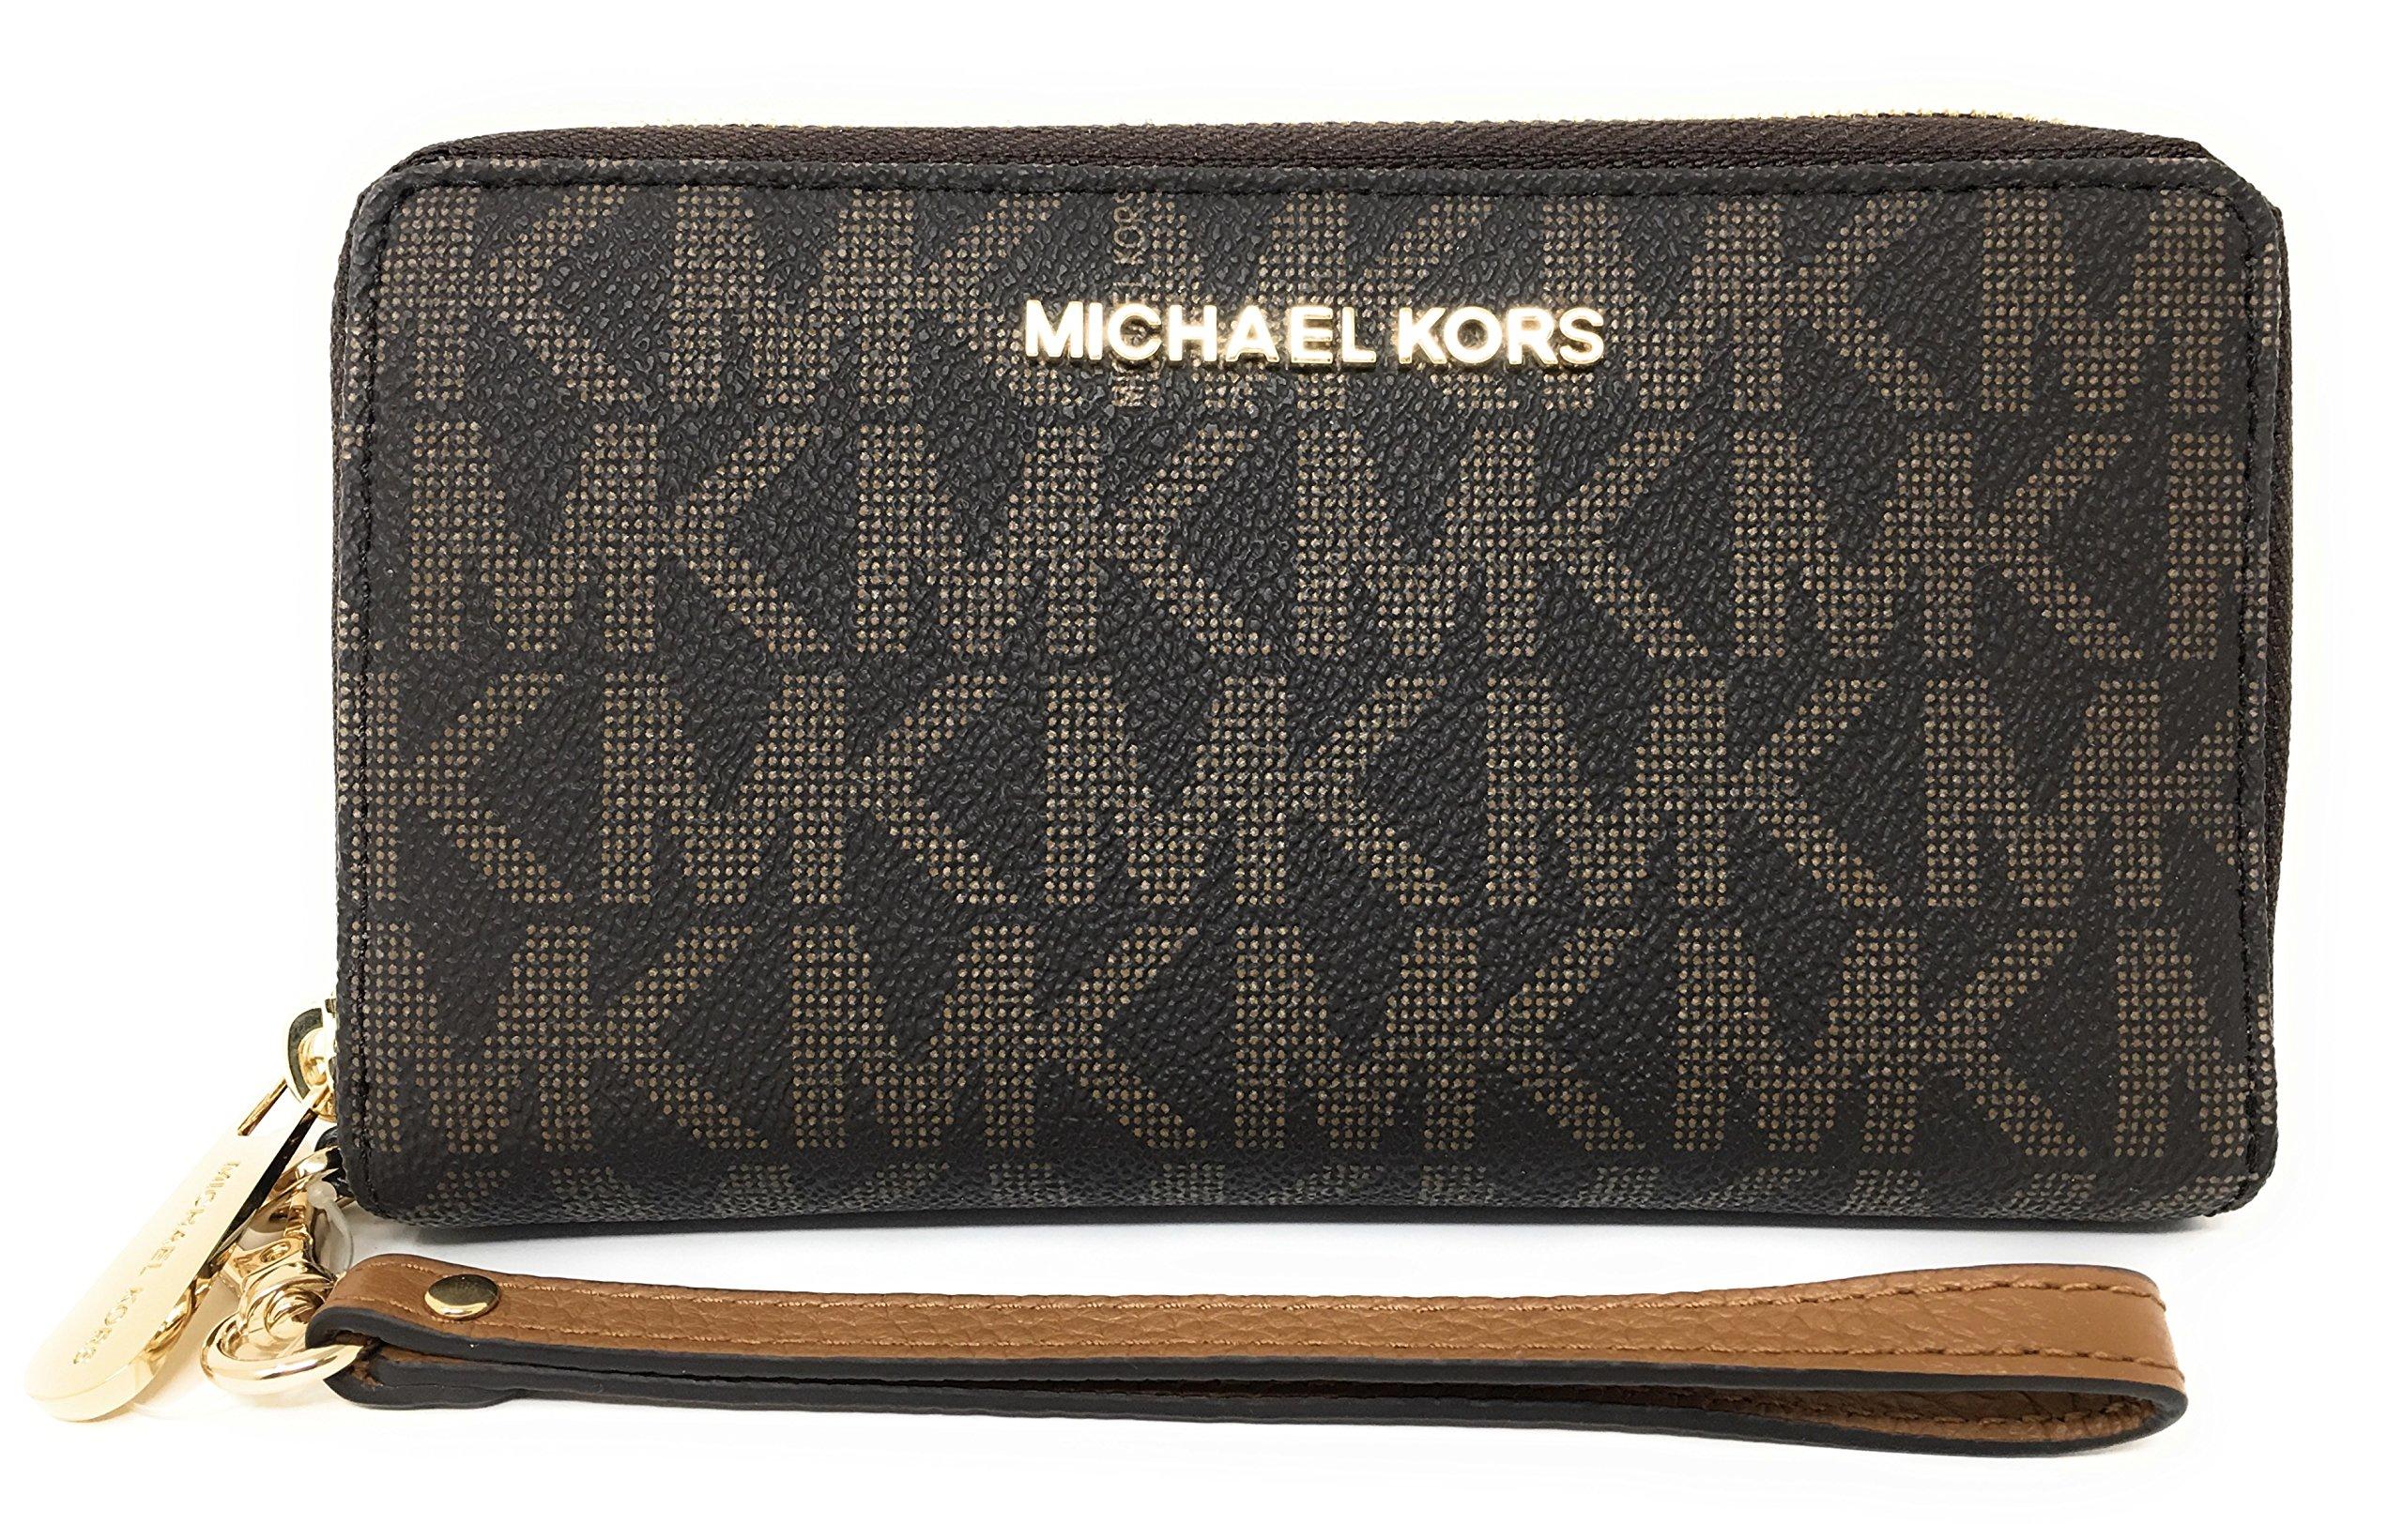 Michael Kors Jet Set Travel Large Flat Multifunction Phone Case Wristlet (Brown/Acorn)